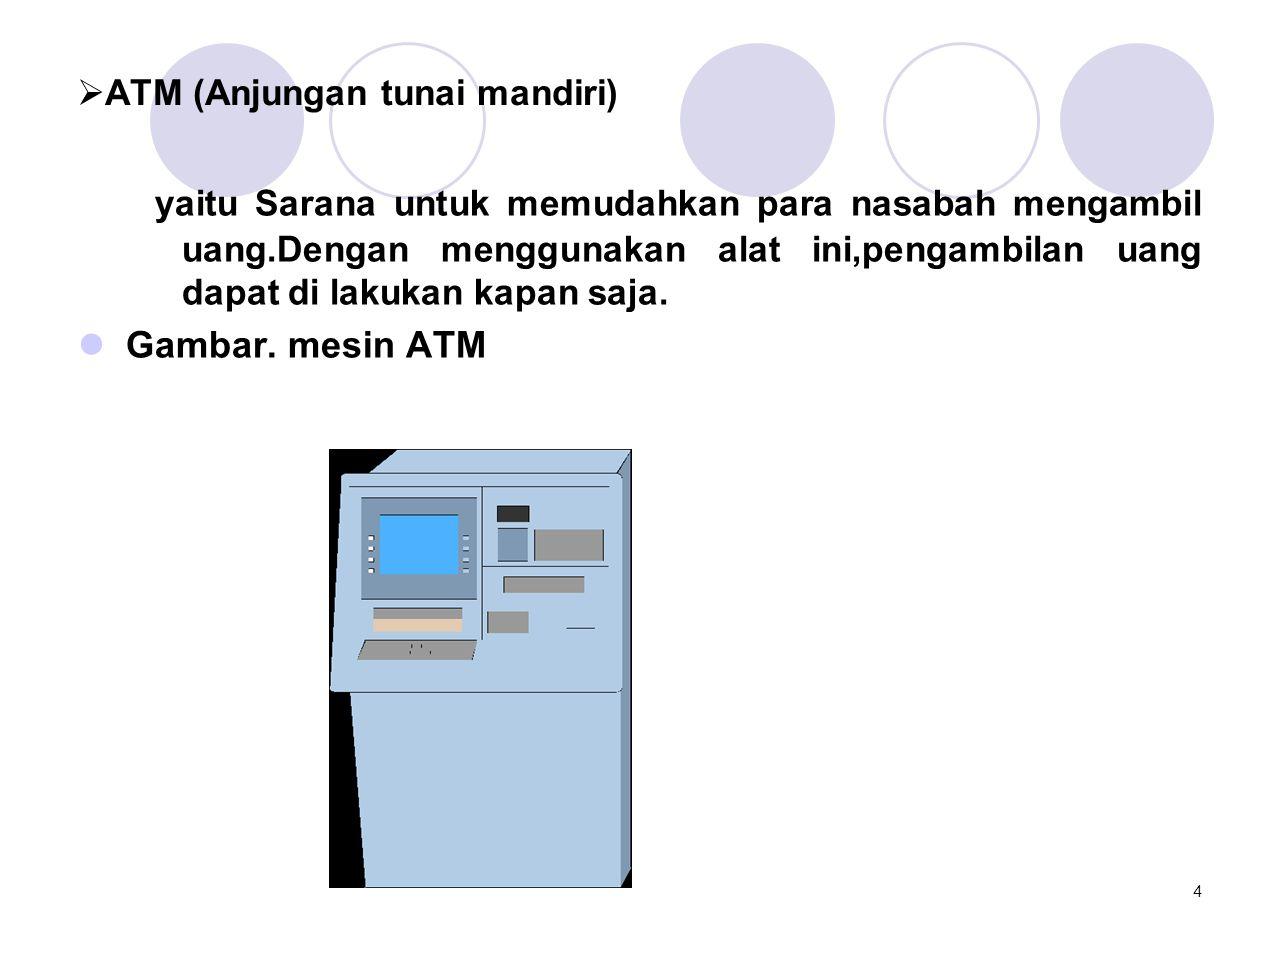  ATM (Anjungan tunai mandiri) yaitu Sarana untuk memudahkan para nasabah mengambil uang.Dengan menggunakan alat ini,pengambilan uang dapat di lakukan